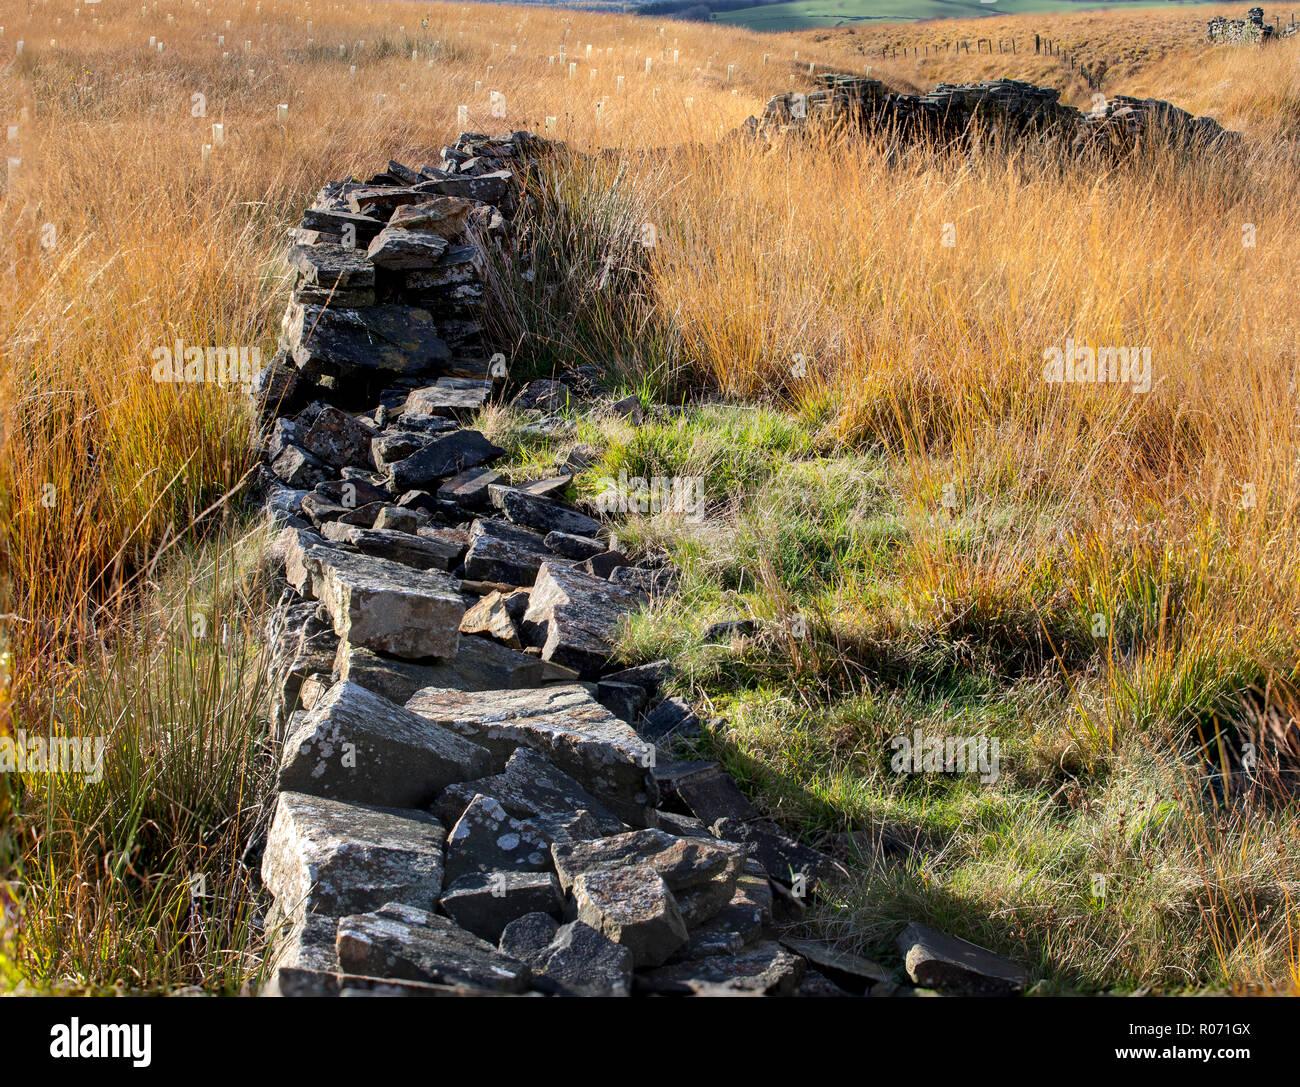 Broken stone wall in the West Pennine Moors traversing bleak moorland. - Stock Image